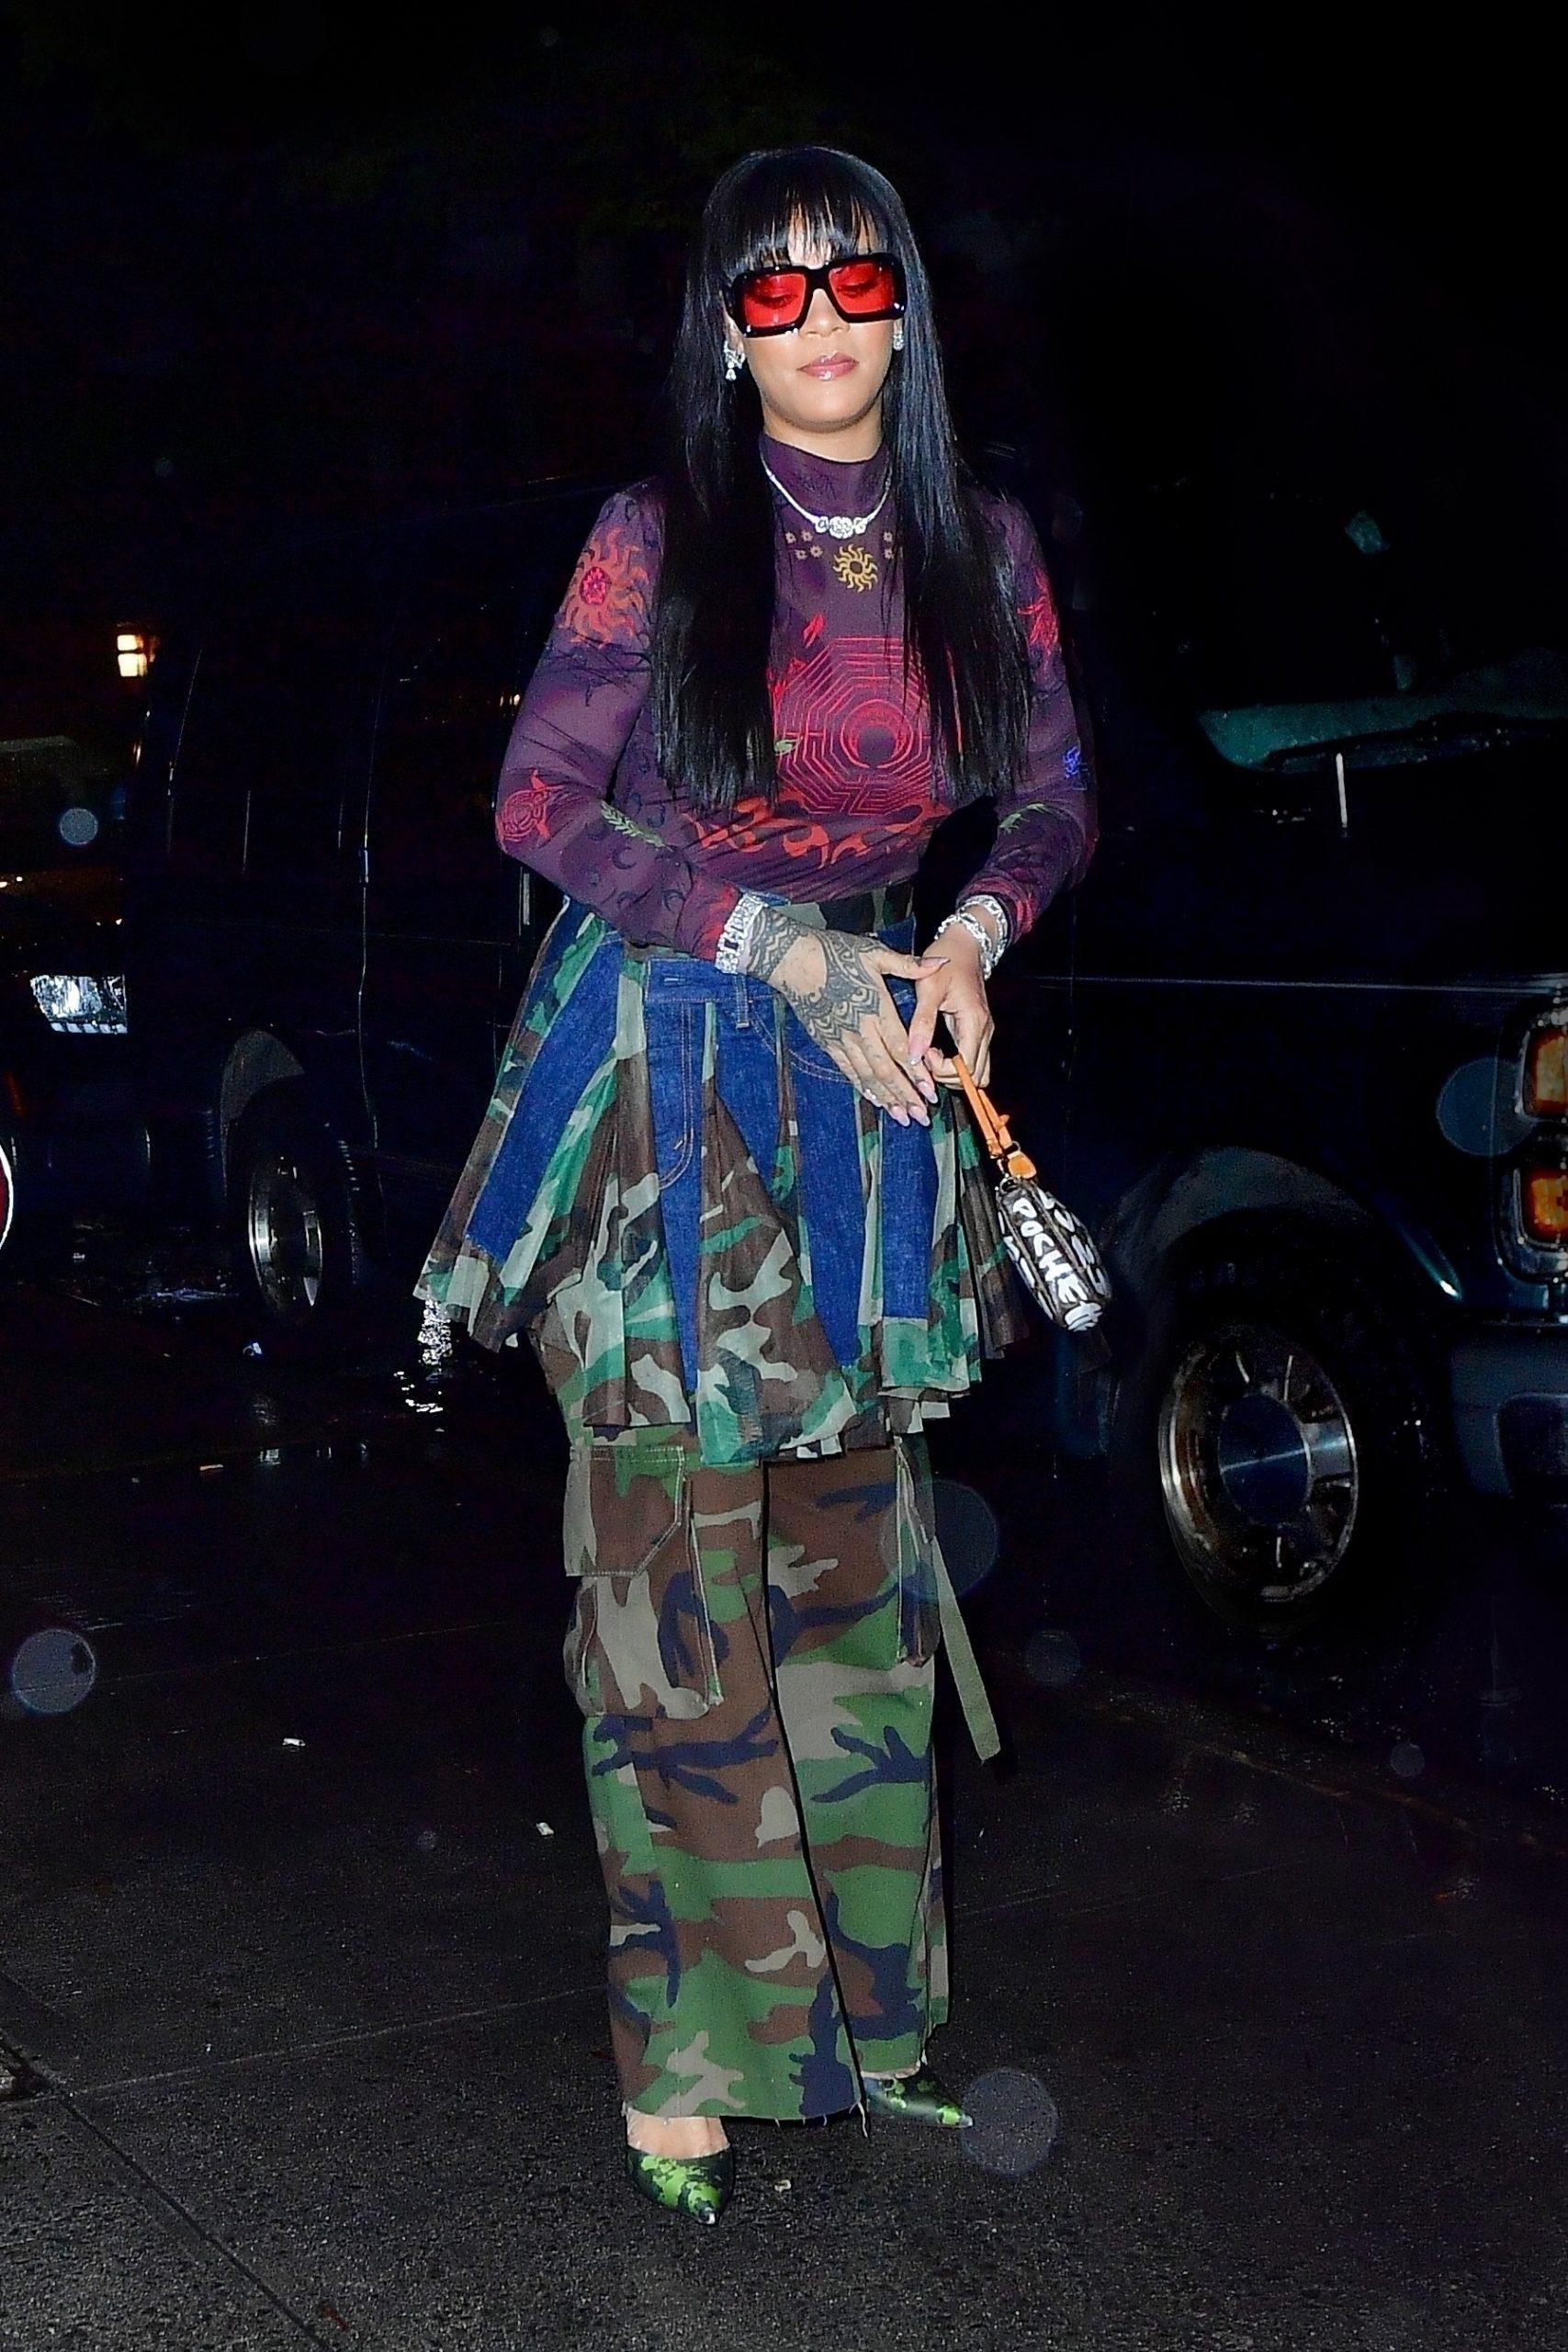 rihanna-in-junya-watanabe-camo-skirt-out-in-new-york-city-september-23-2021